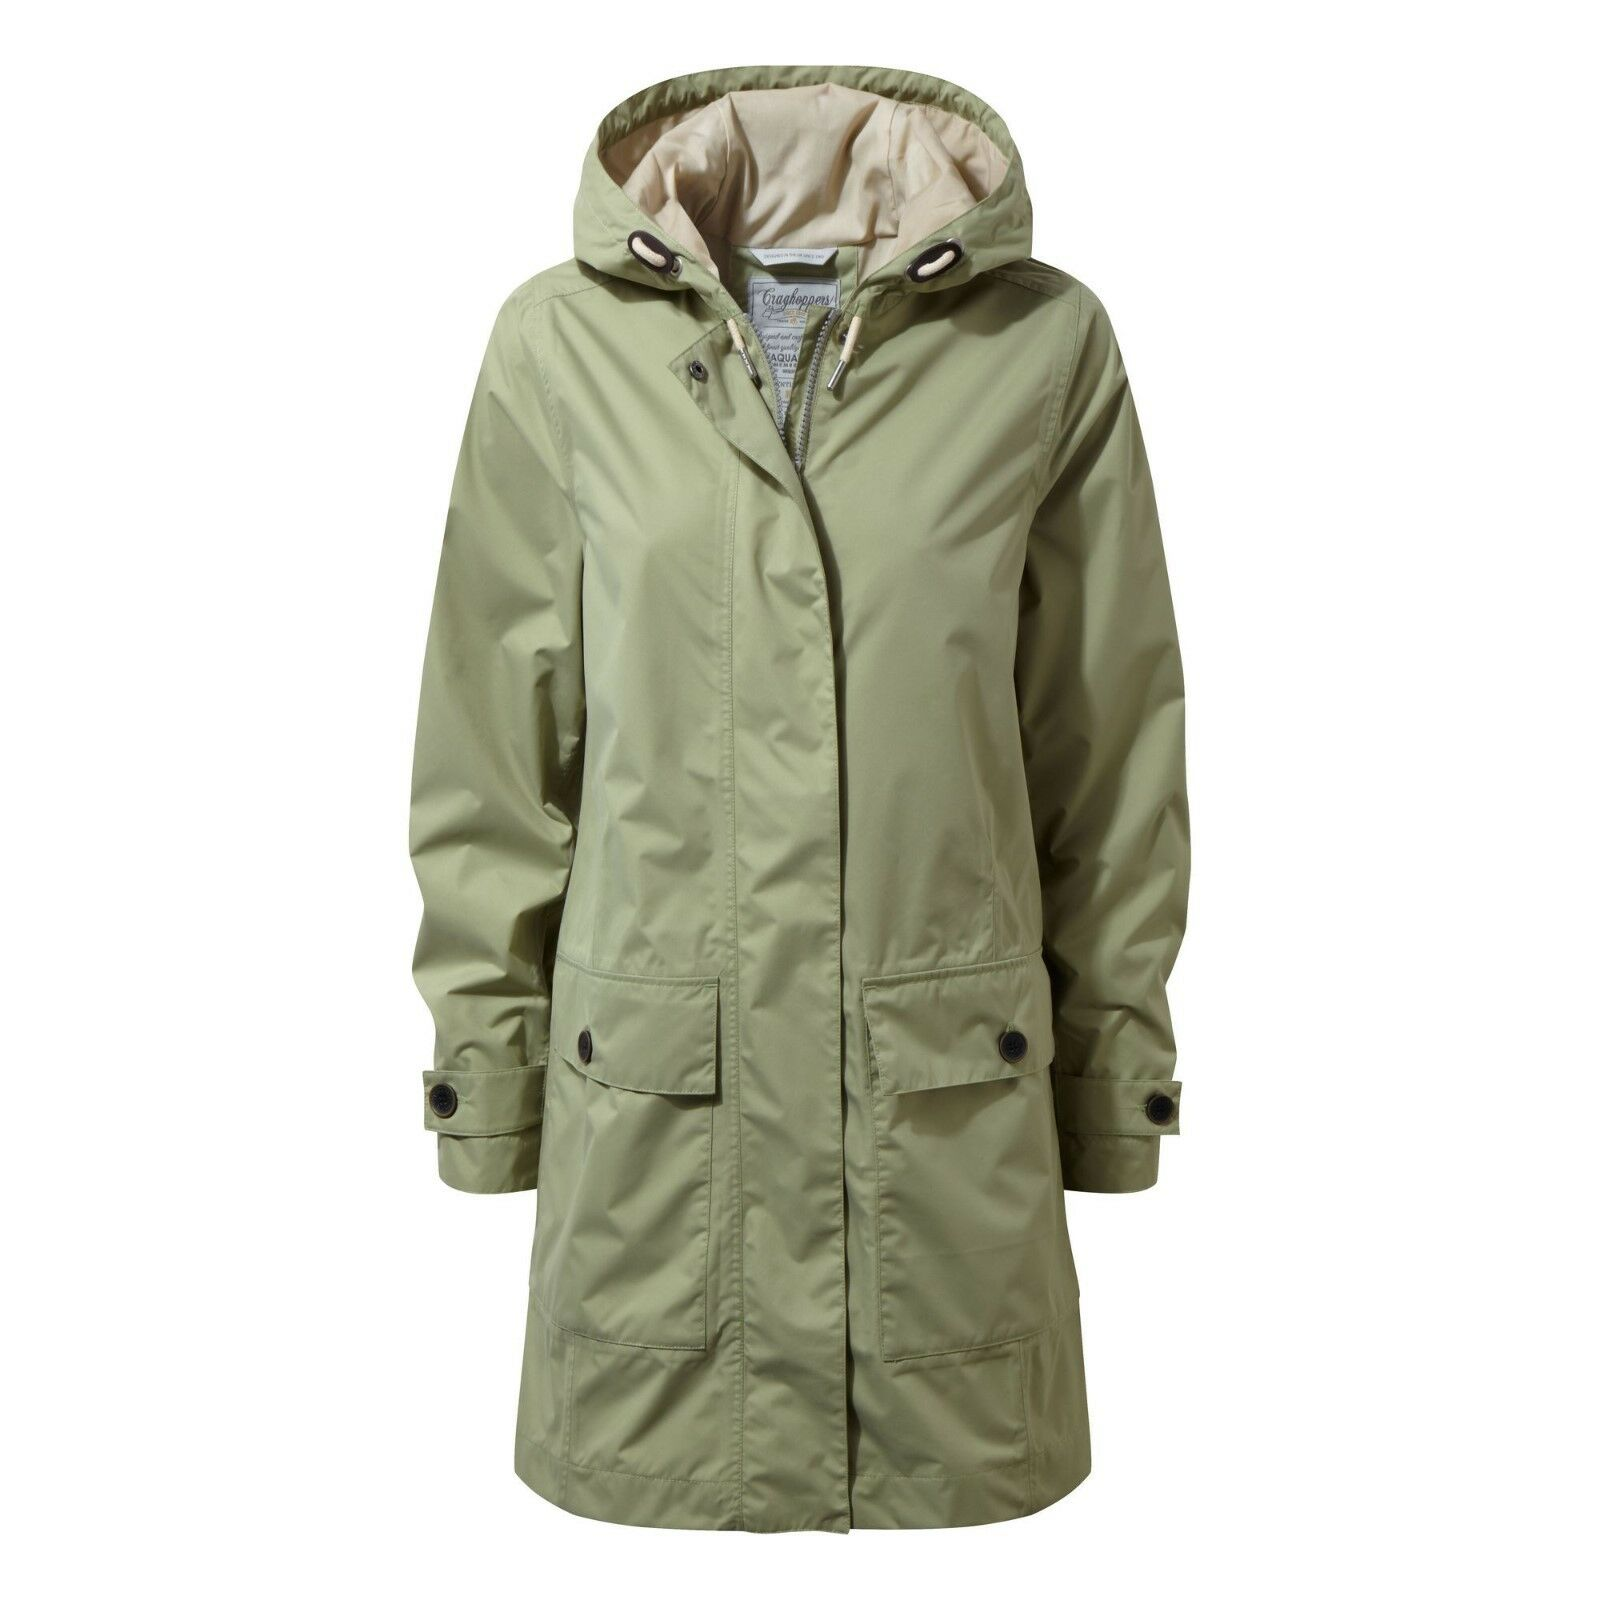 Craghoppers Women's Kylie Waterproof Long Coat - Bush Green